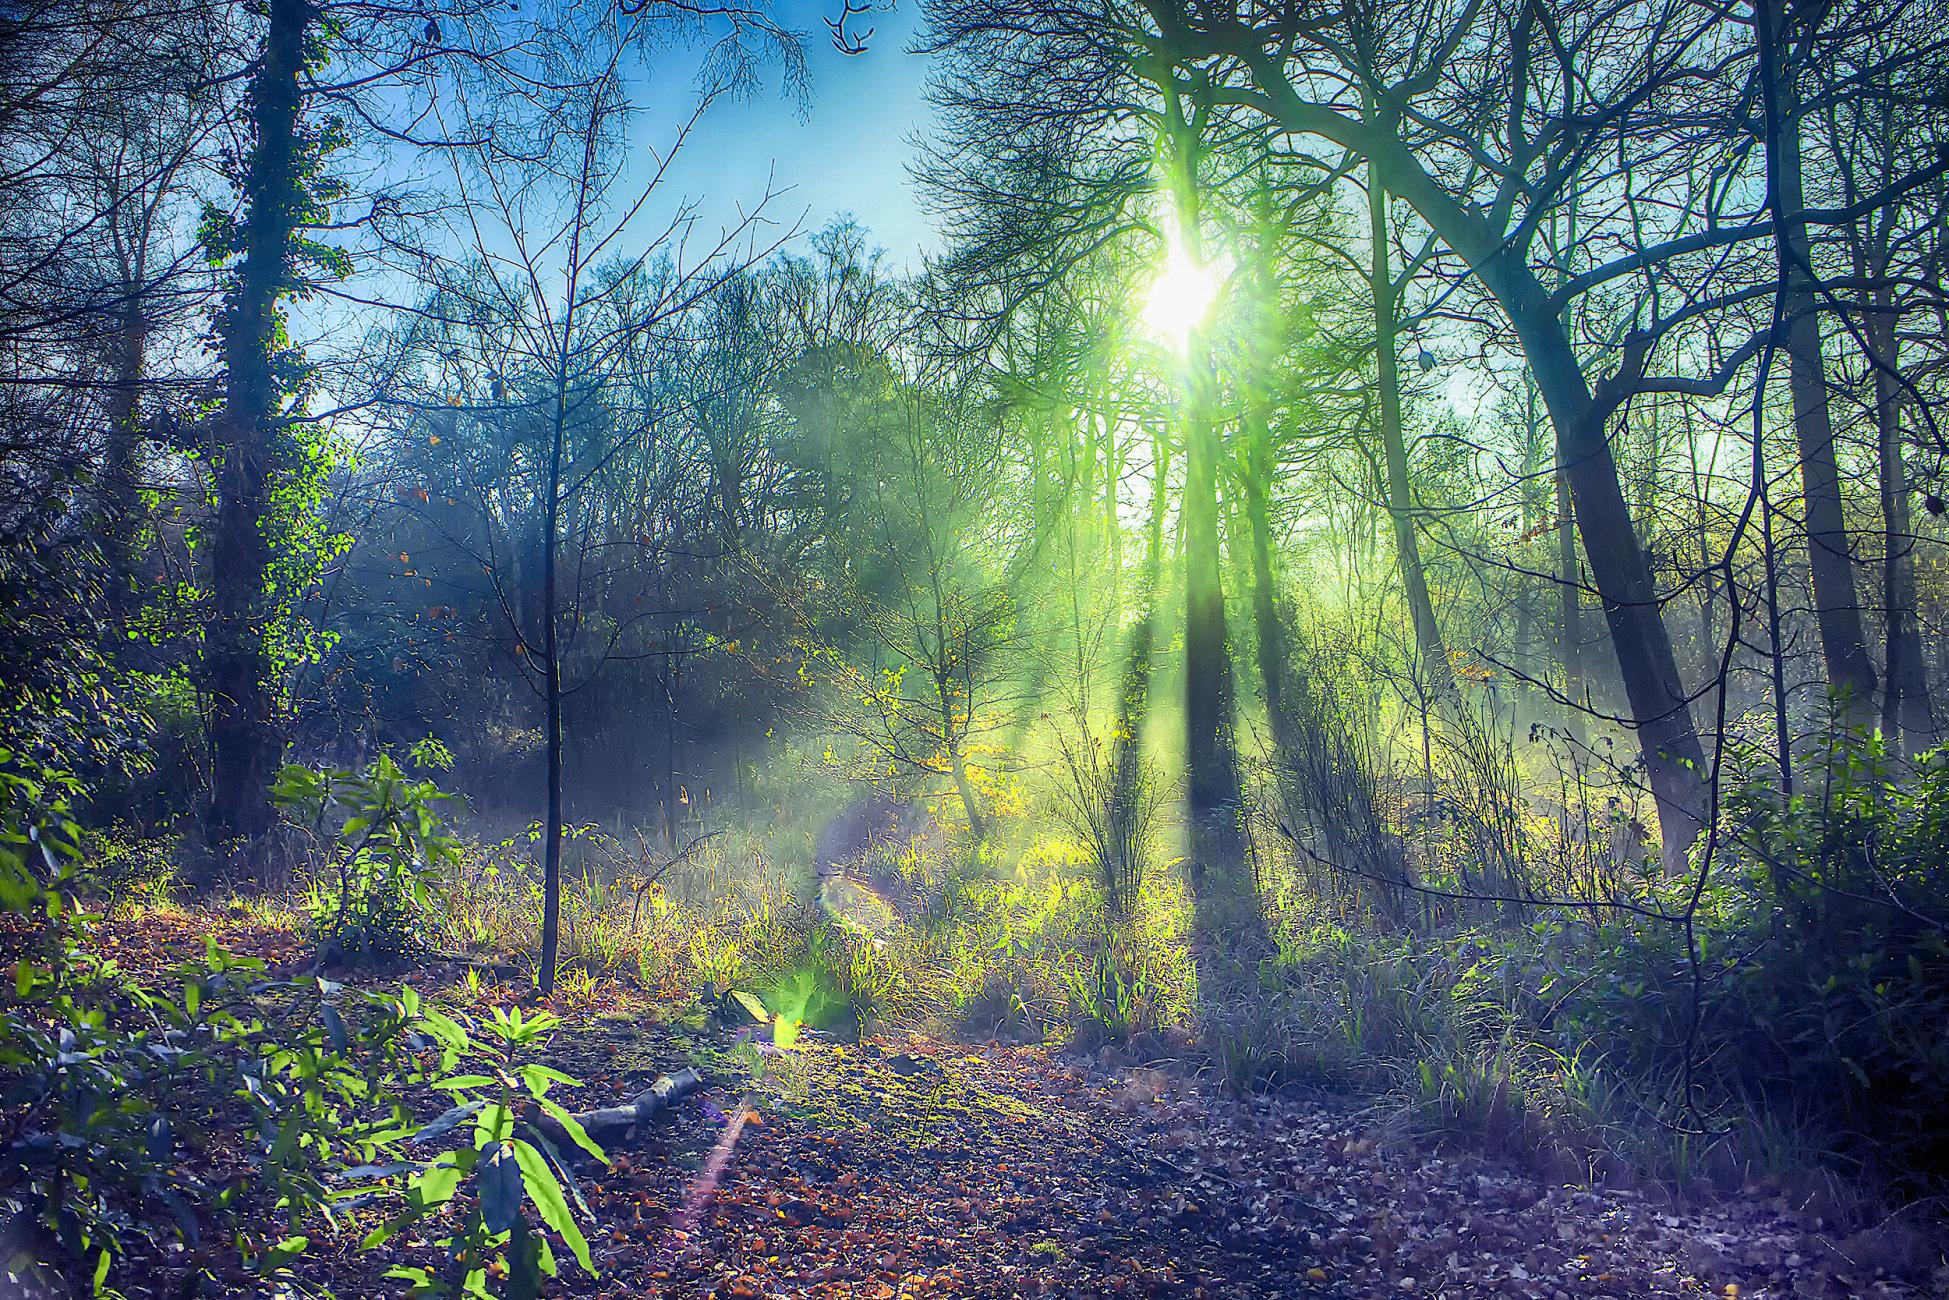 taken in 100 acres wood Wickham, hampshire